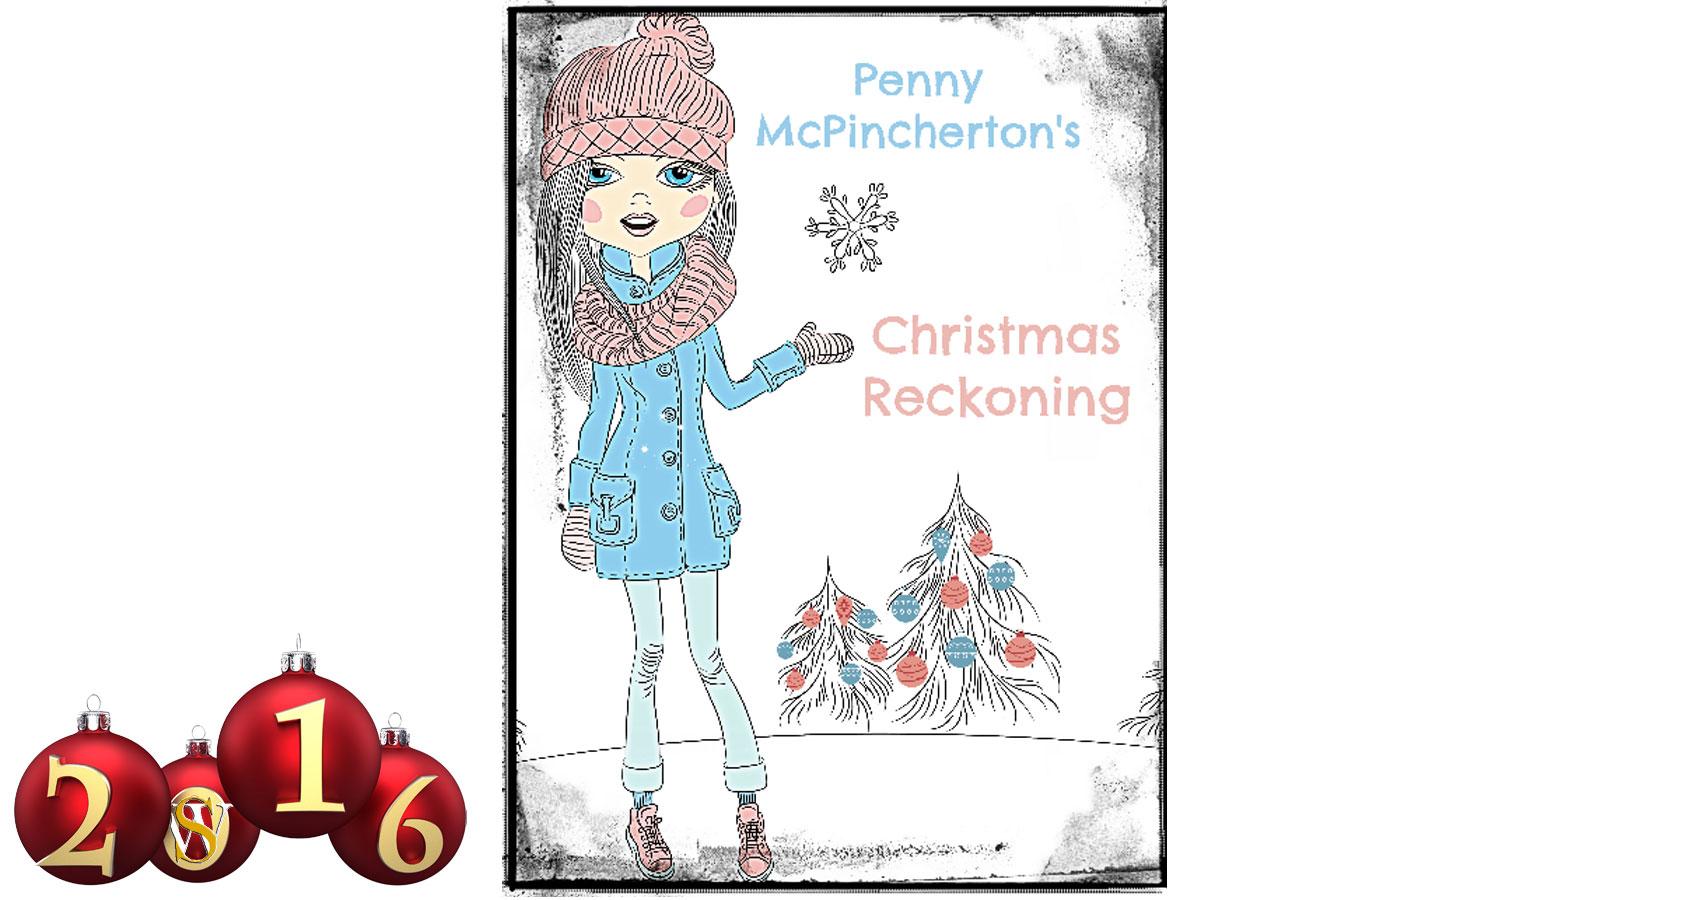 Penny McPincherton's Christmas Reckoning written by Melissa McNallan at Spillwords.com